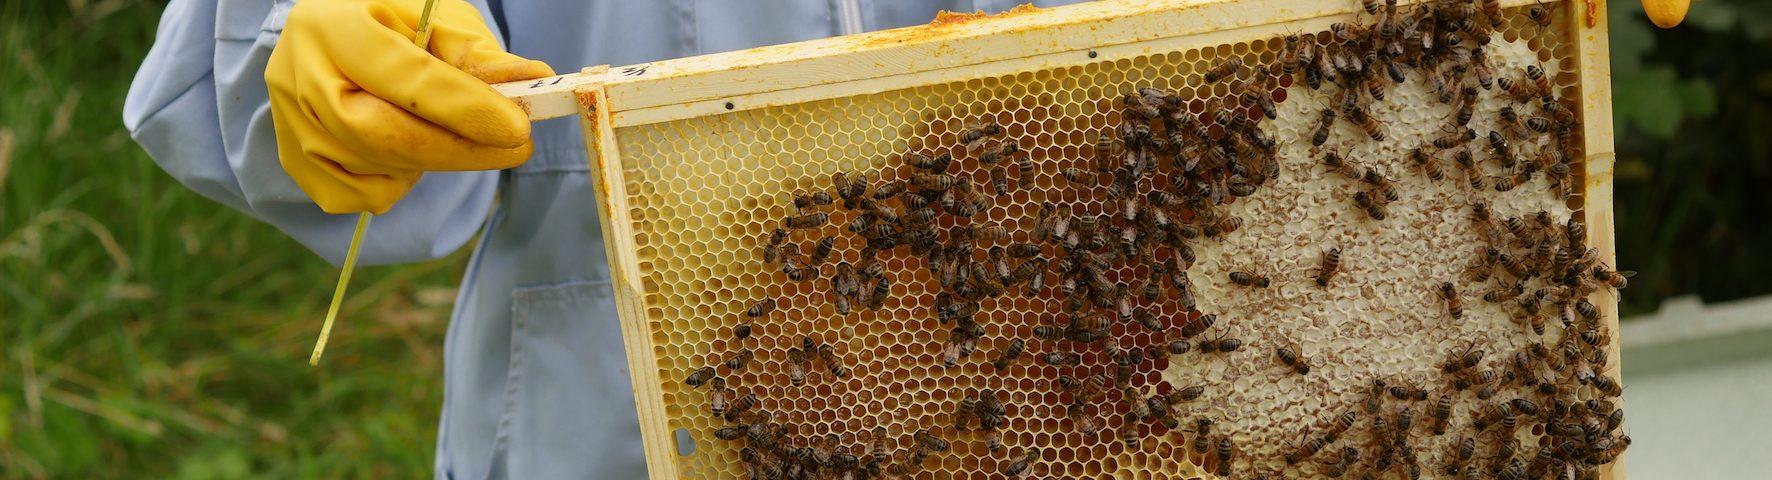 honeybees on a frame